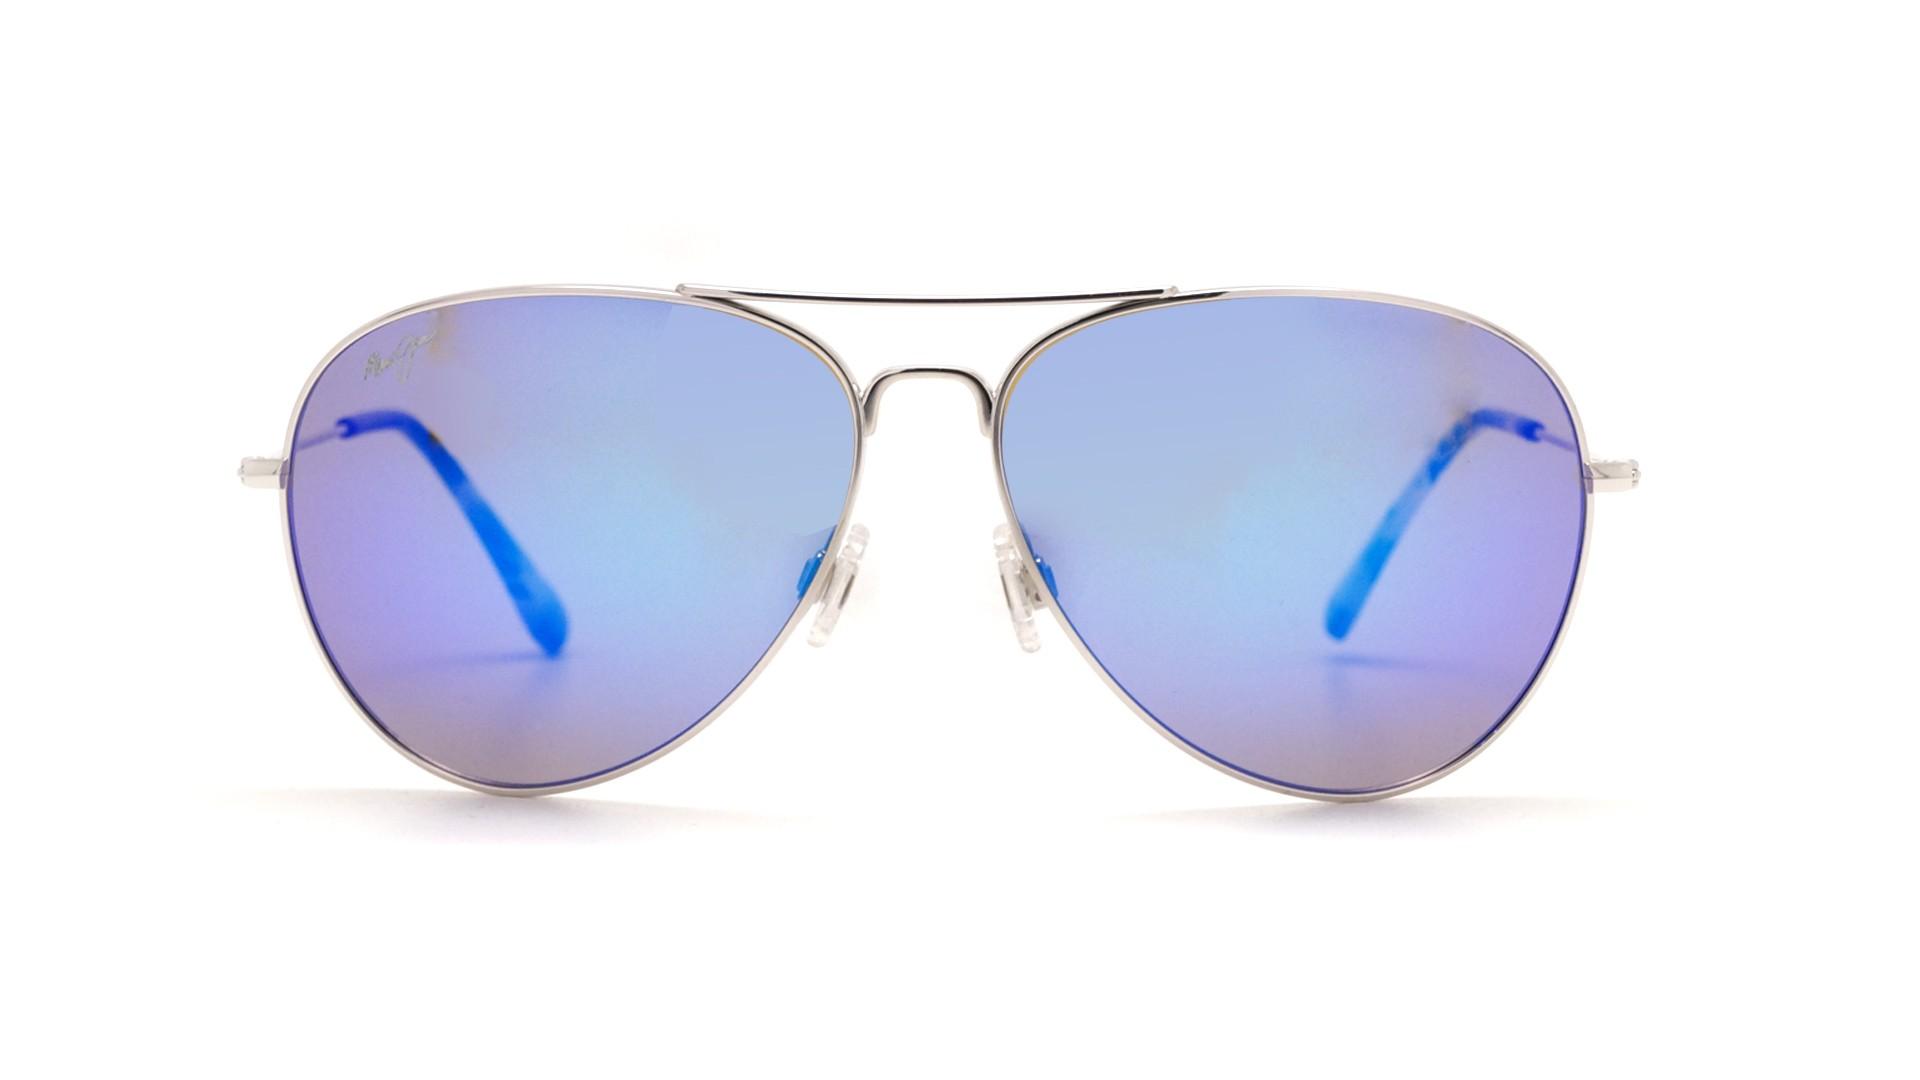 Maui Jim Mavericks Silver B264 17 61 14 Polaris 233 S